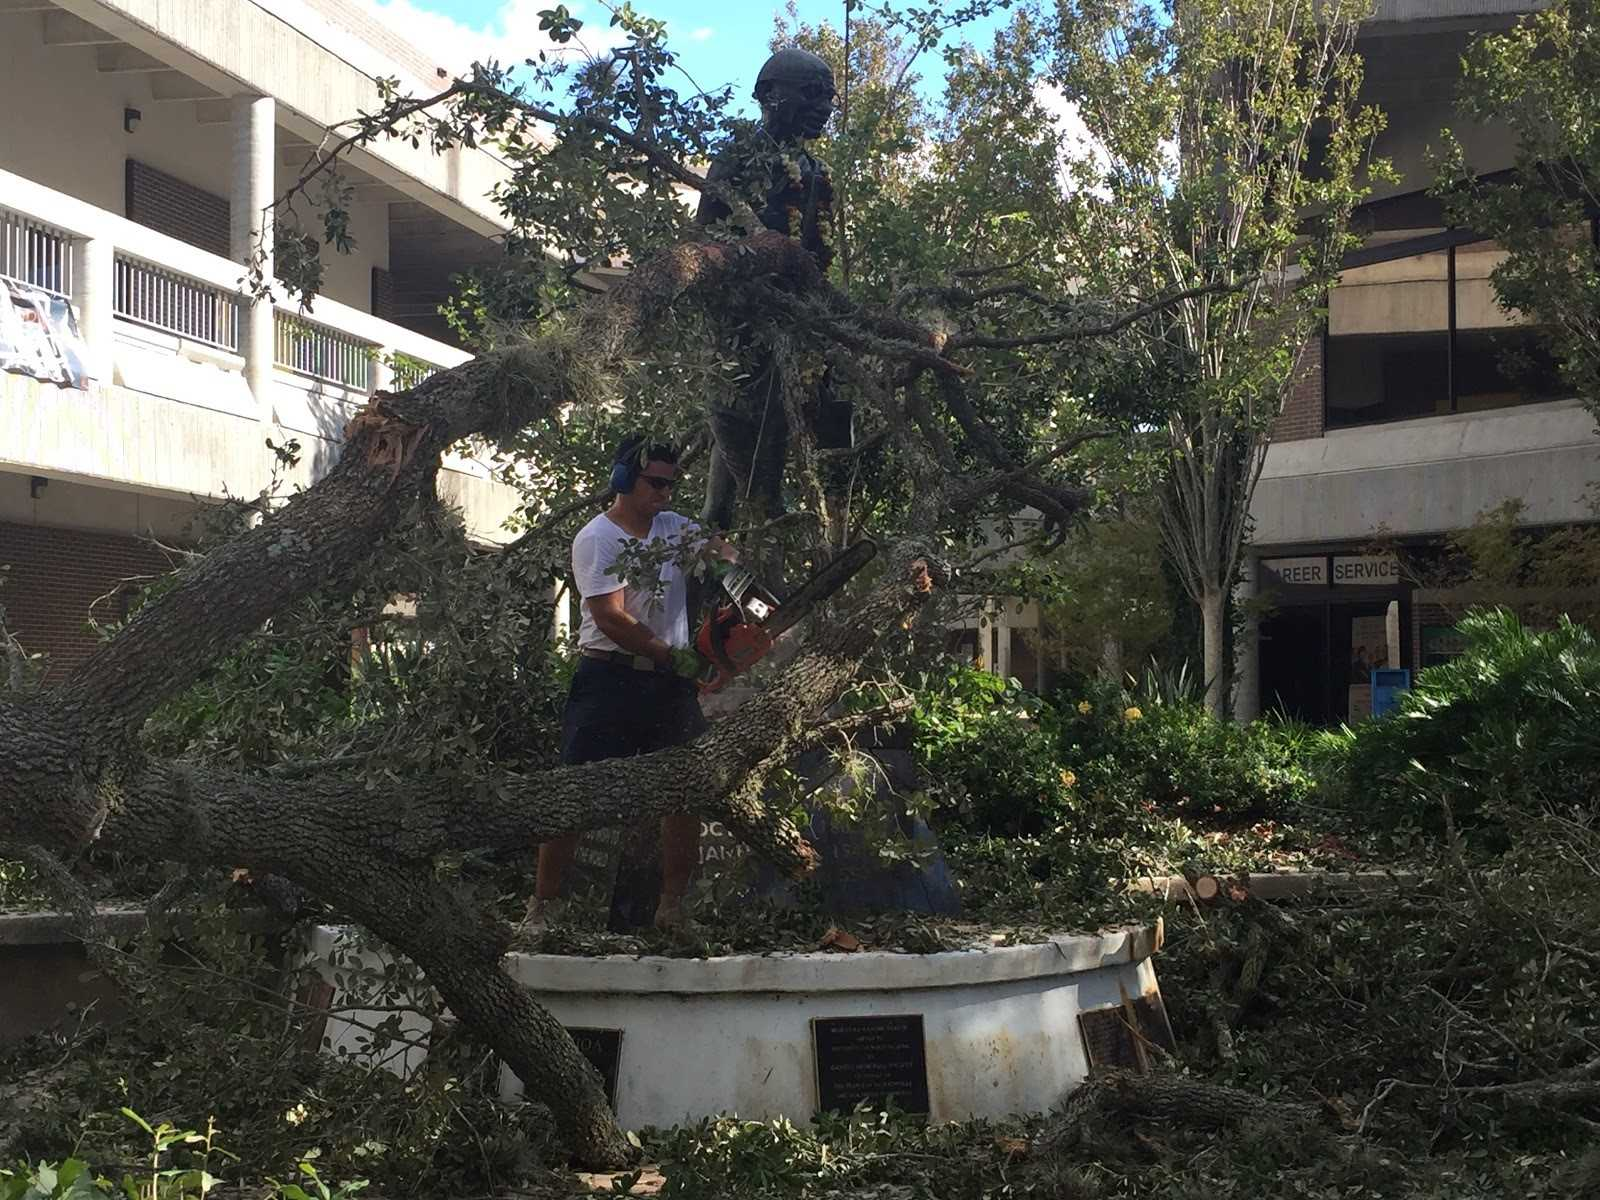 Post-Matthew: UNF alum returns to clean up favorite statue